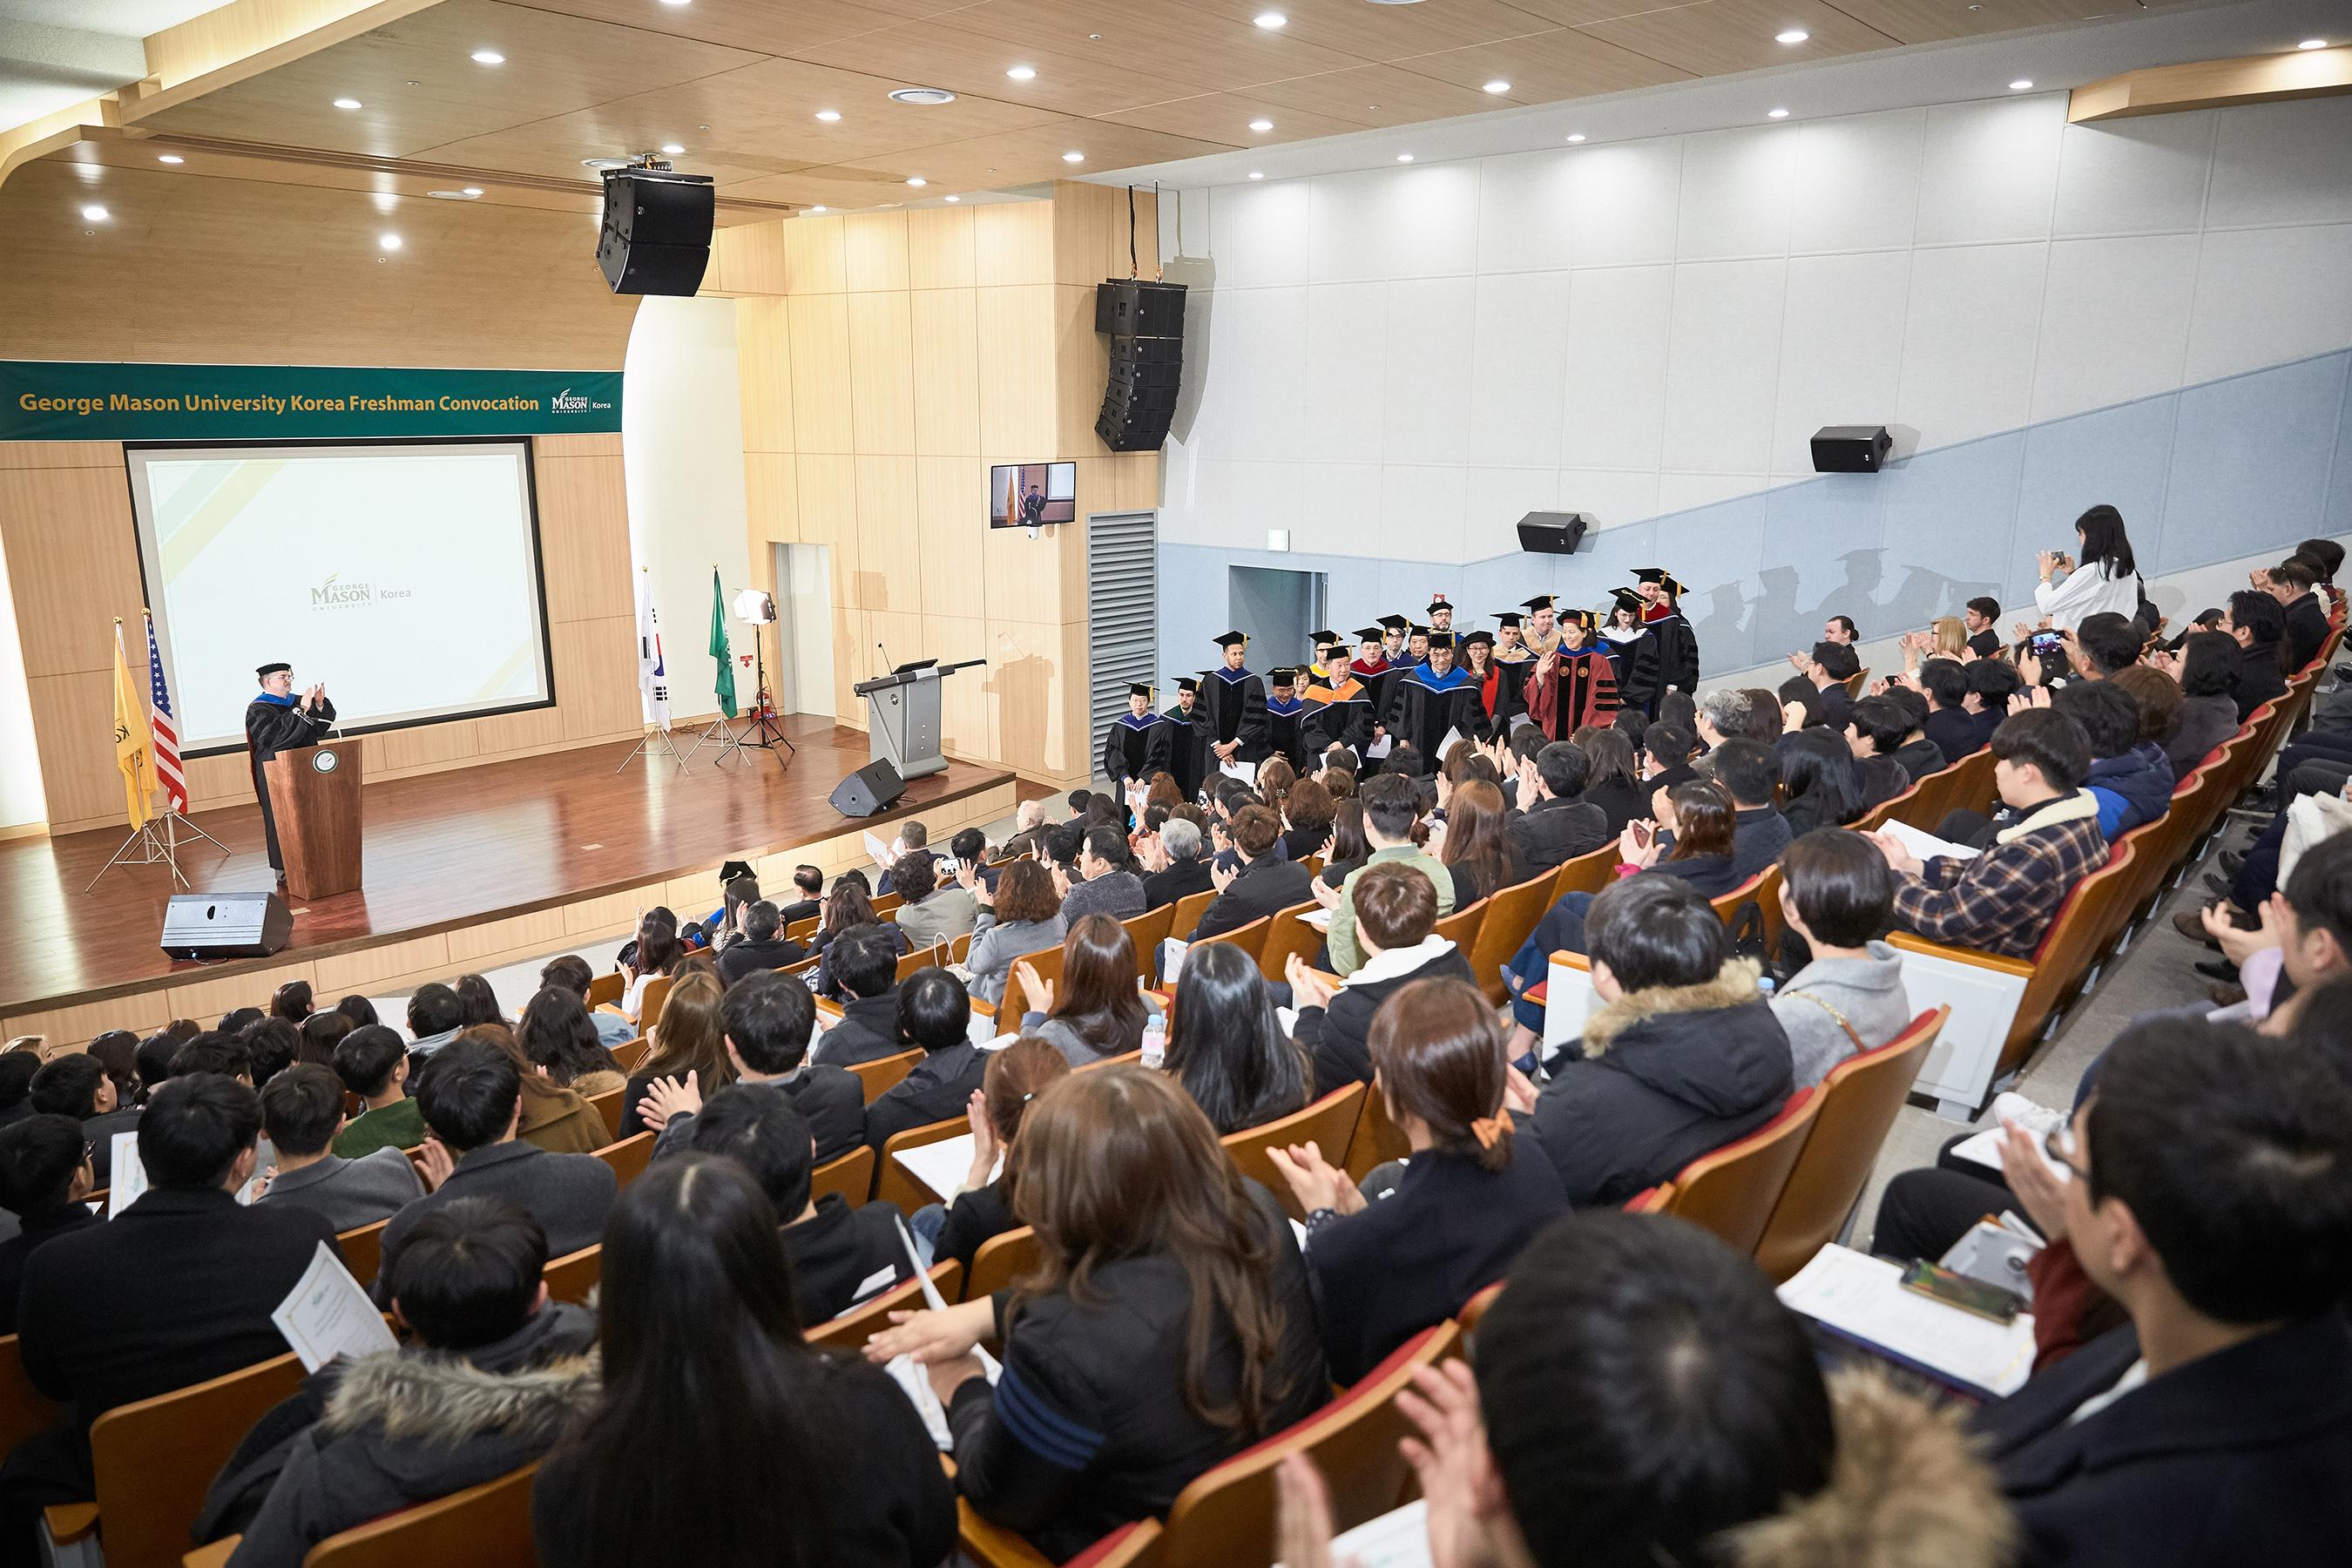 George Mason University Korea 2017 Spring Convocation